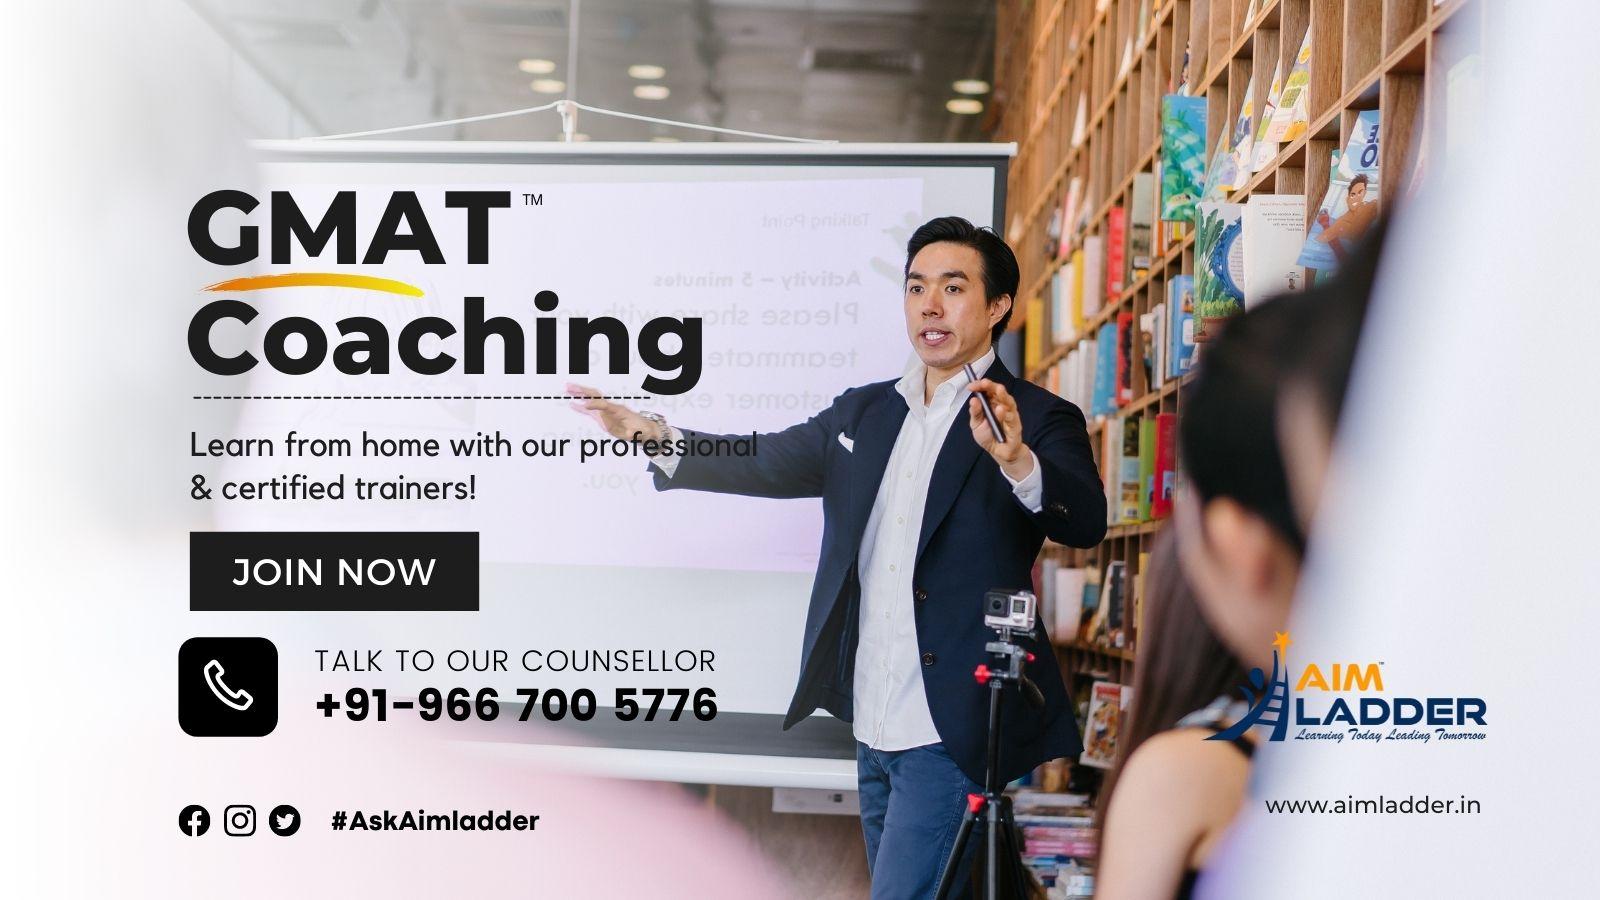 GMAT Coaching - with Aim Ladder